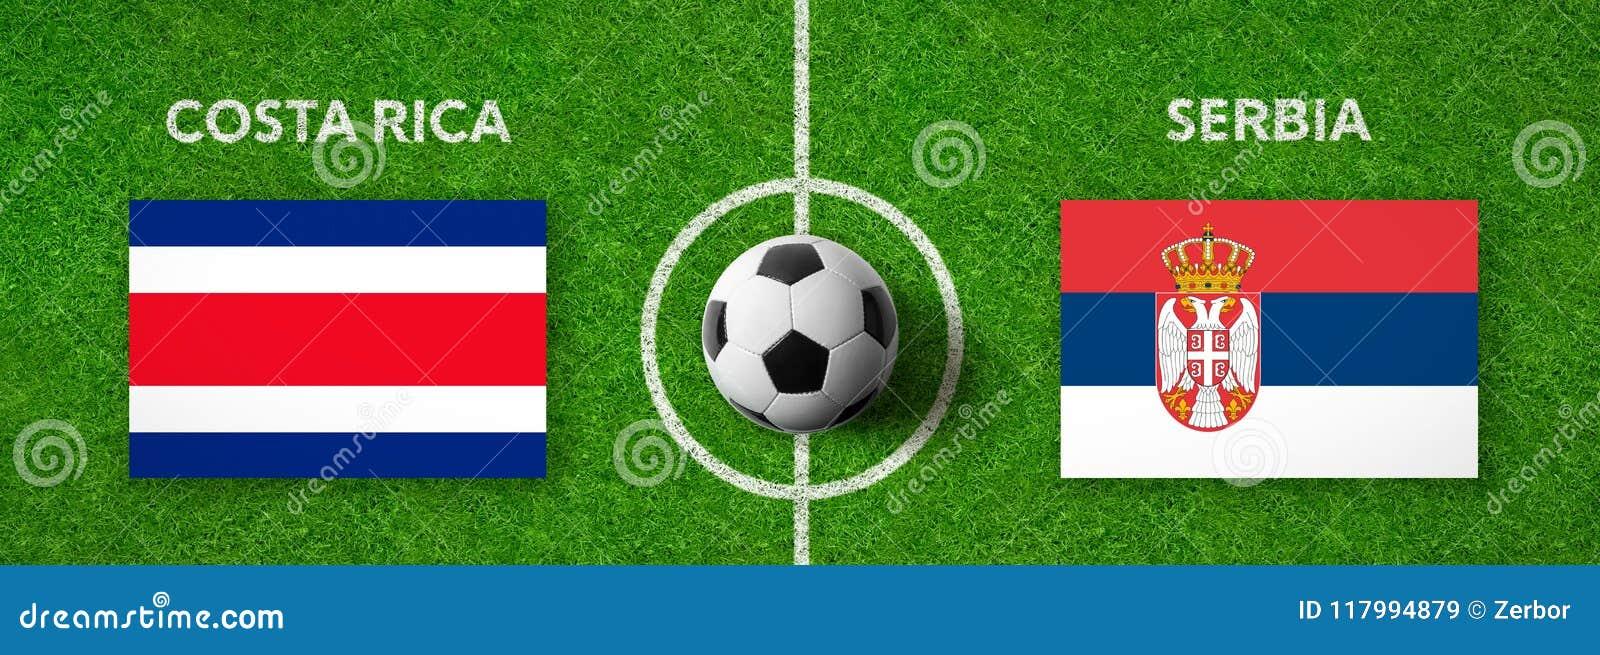 Fotbollsmatch Costa Rica vs serbia